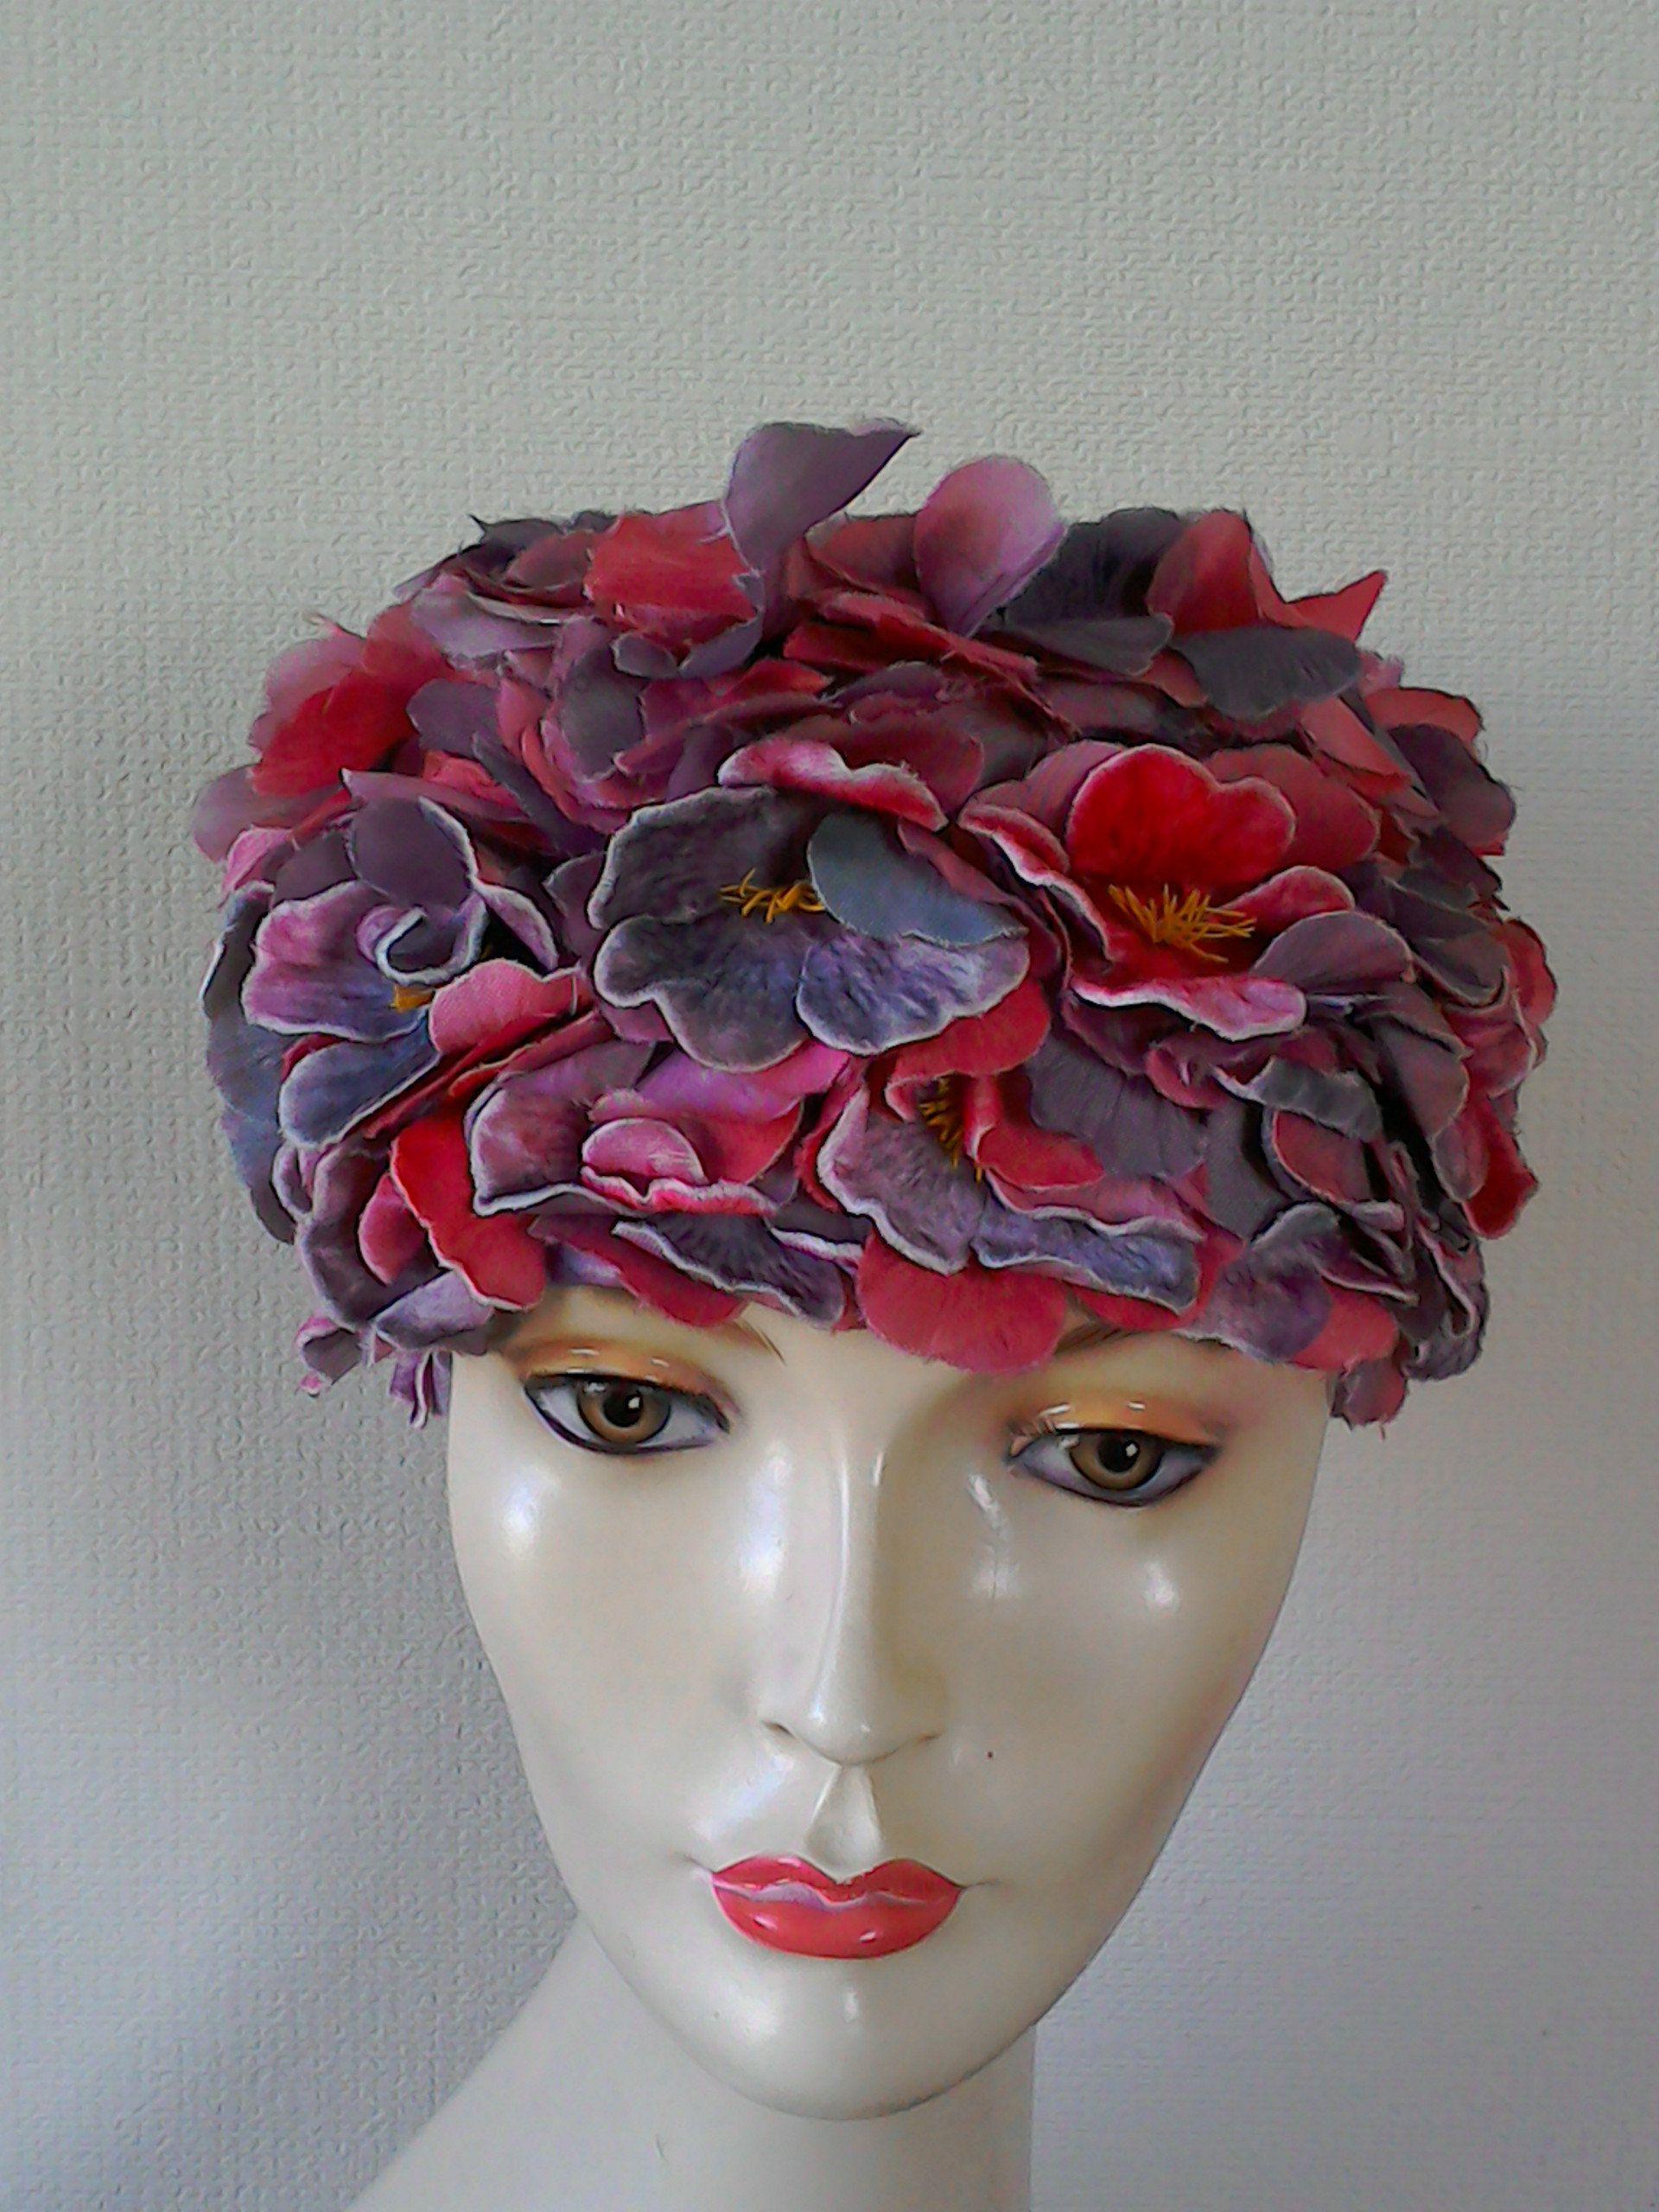 Vintage Hat 1960s Womens Hats Pink Purple Velvet Flowers Etsy Vintage Wedding Hats Velvet Flowers Hats Vintage